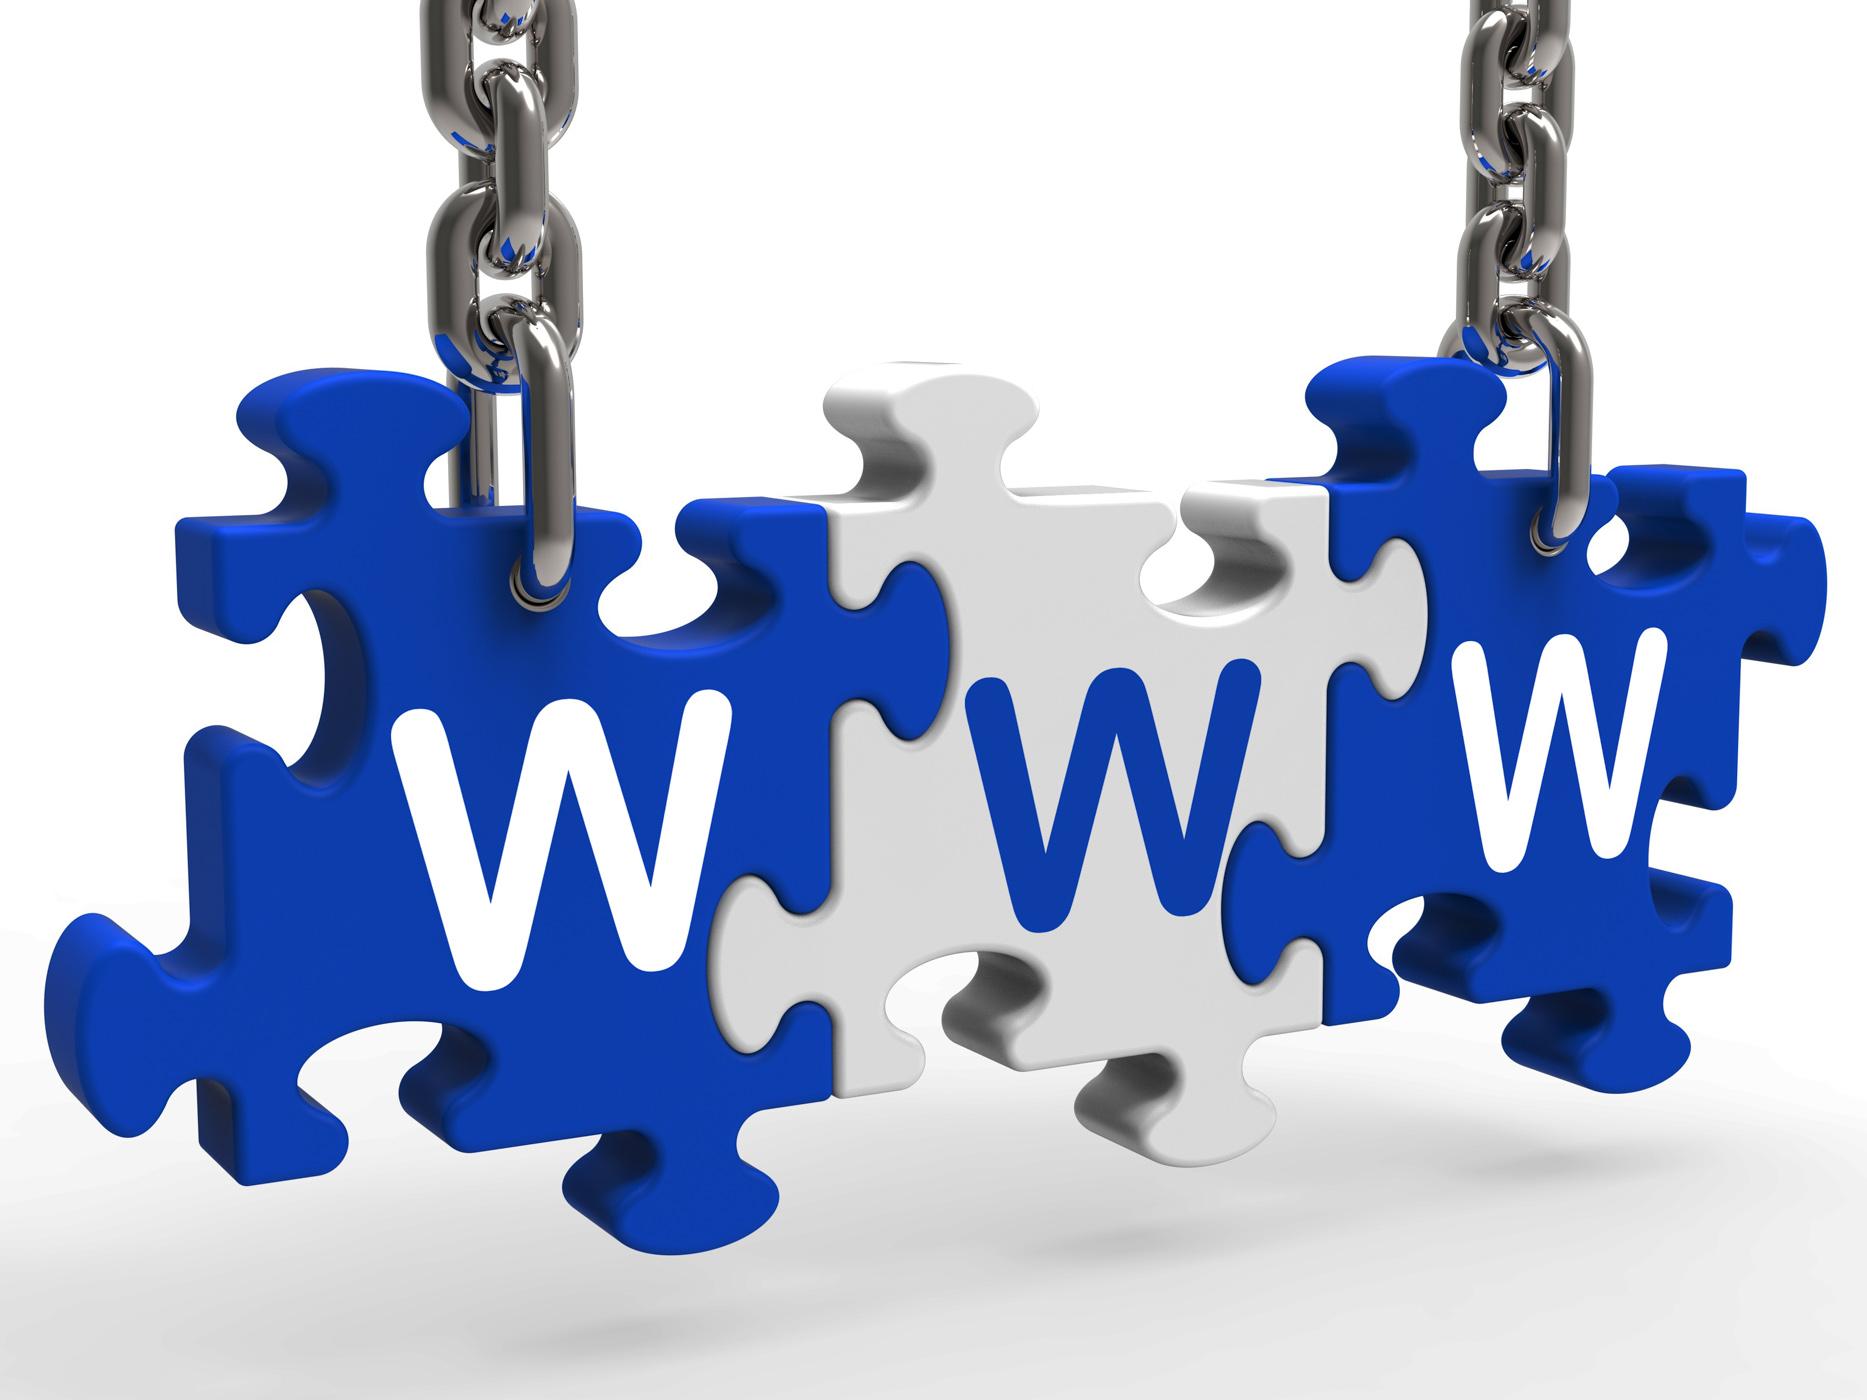 Www Puzzle Shows Online Websites Or Internet, Http, Information, Internet, Net, HQ Photo